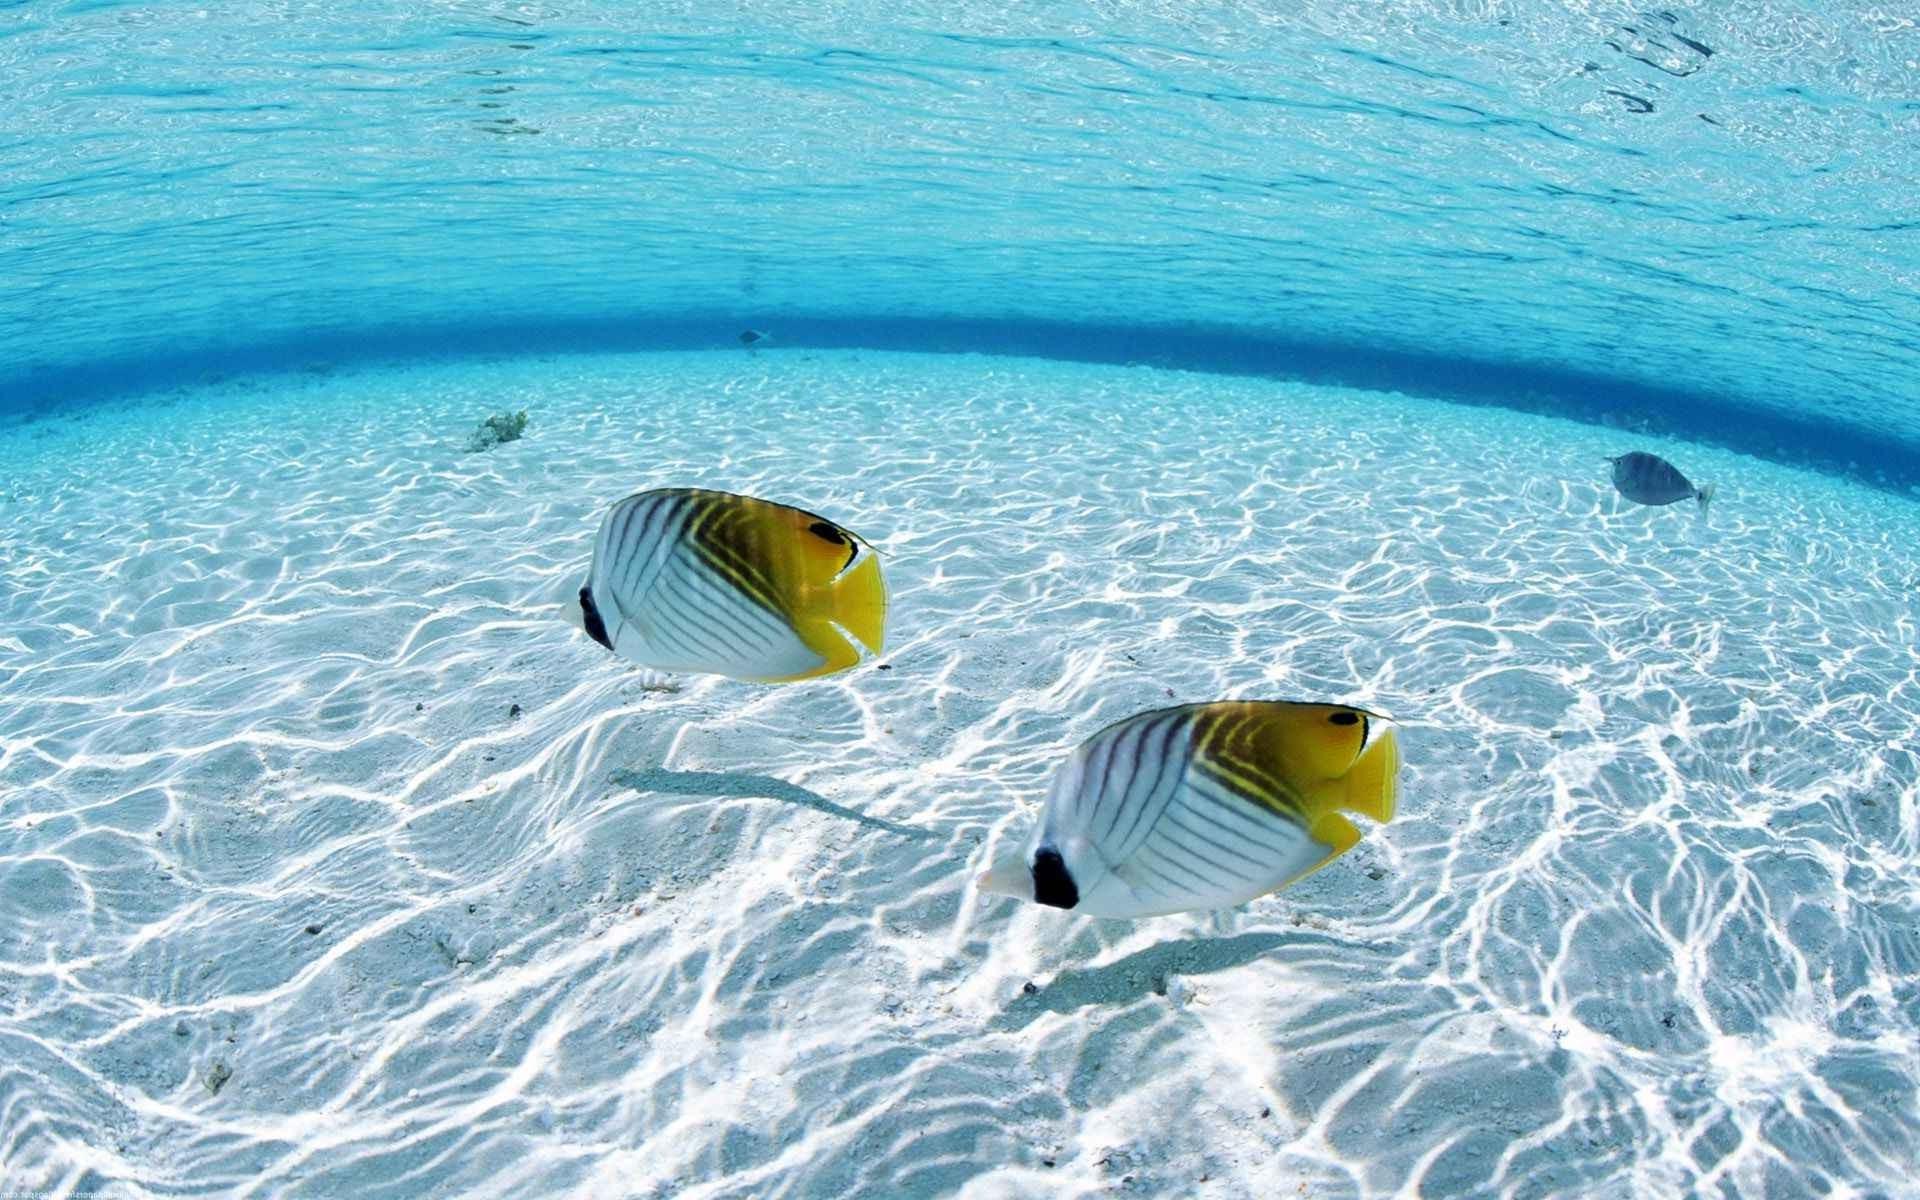 Hd wallpaper underwater - Fish Sea Underwater Wallpaper Hd